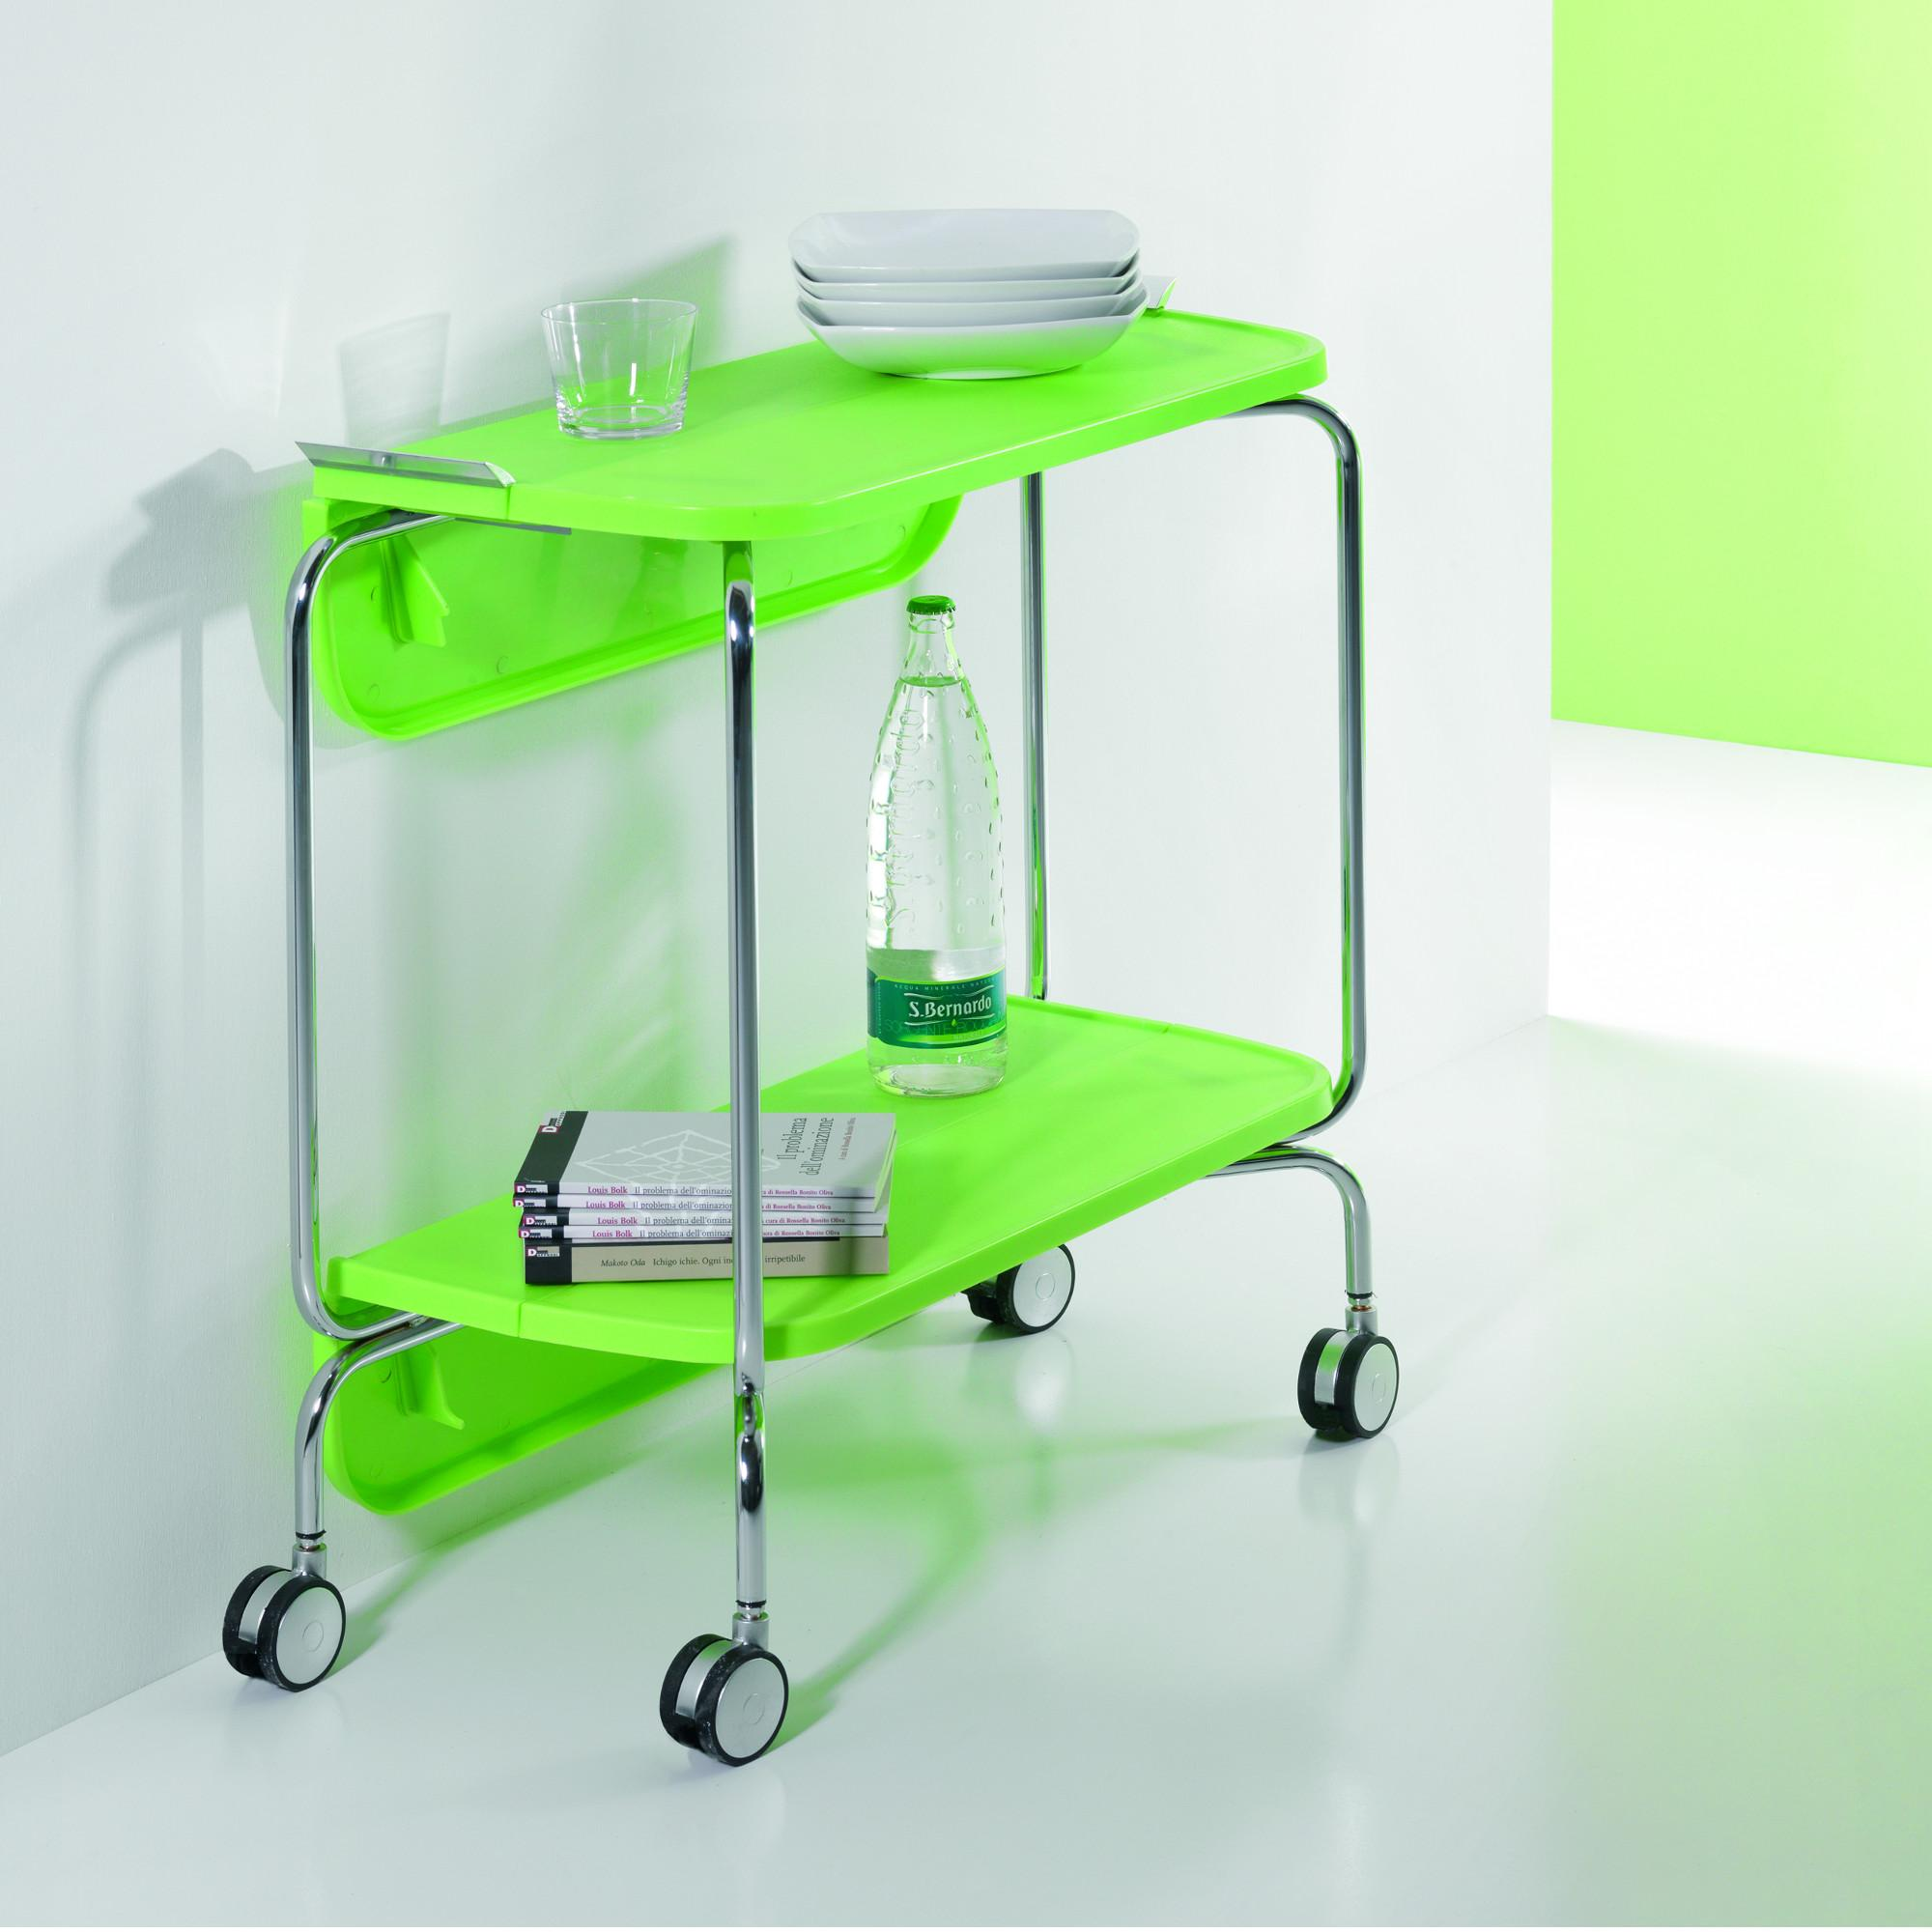 Idee lavanderia decoracion for Ikea carrello cucina